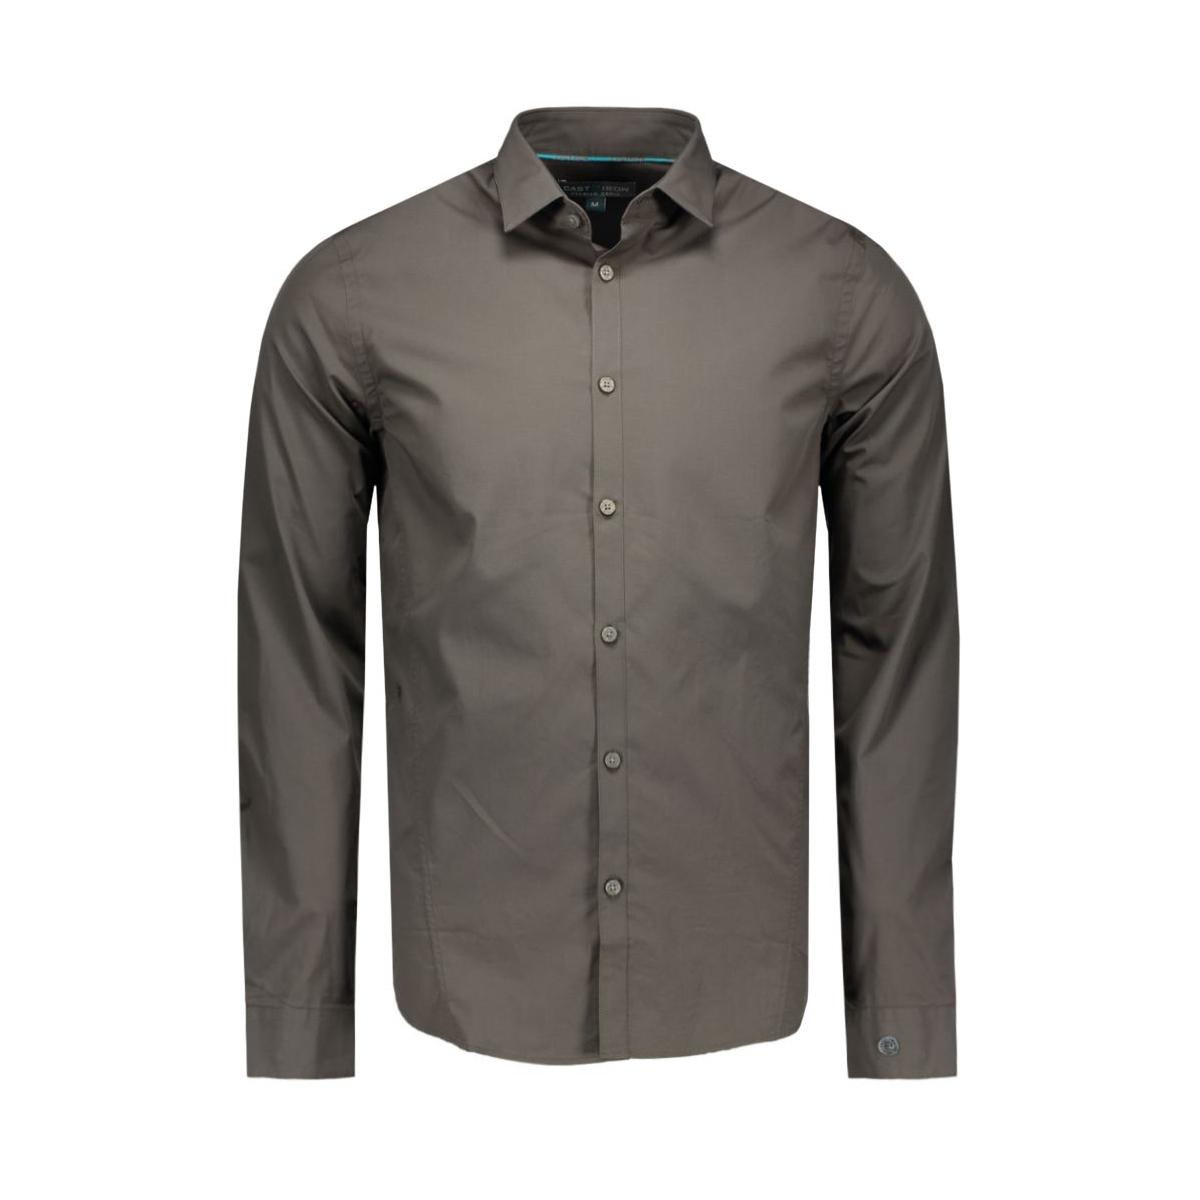 csi65690 cast iron overhemd 7695